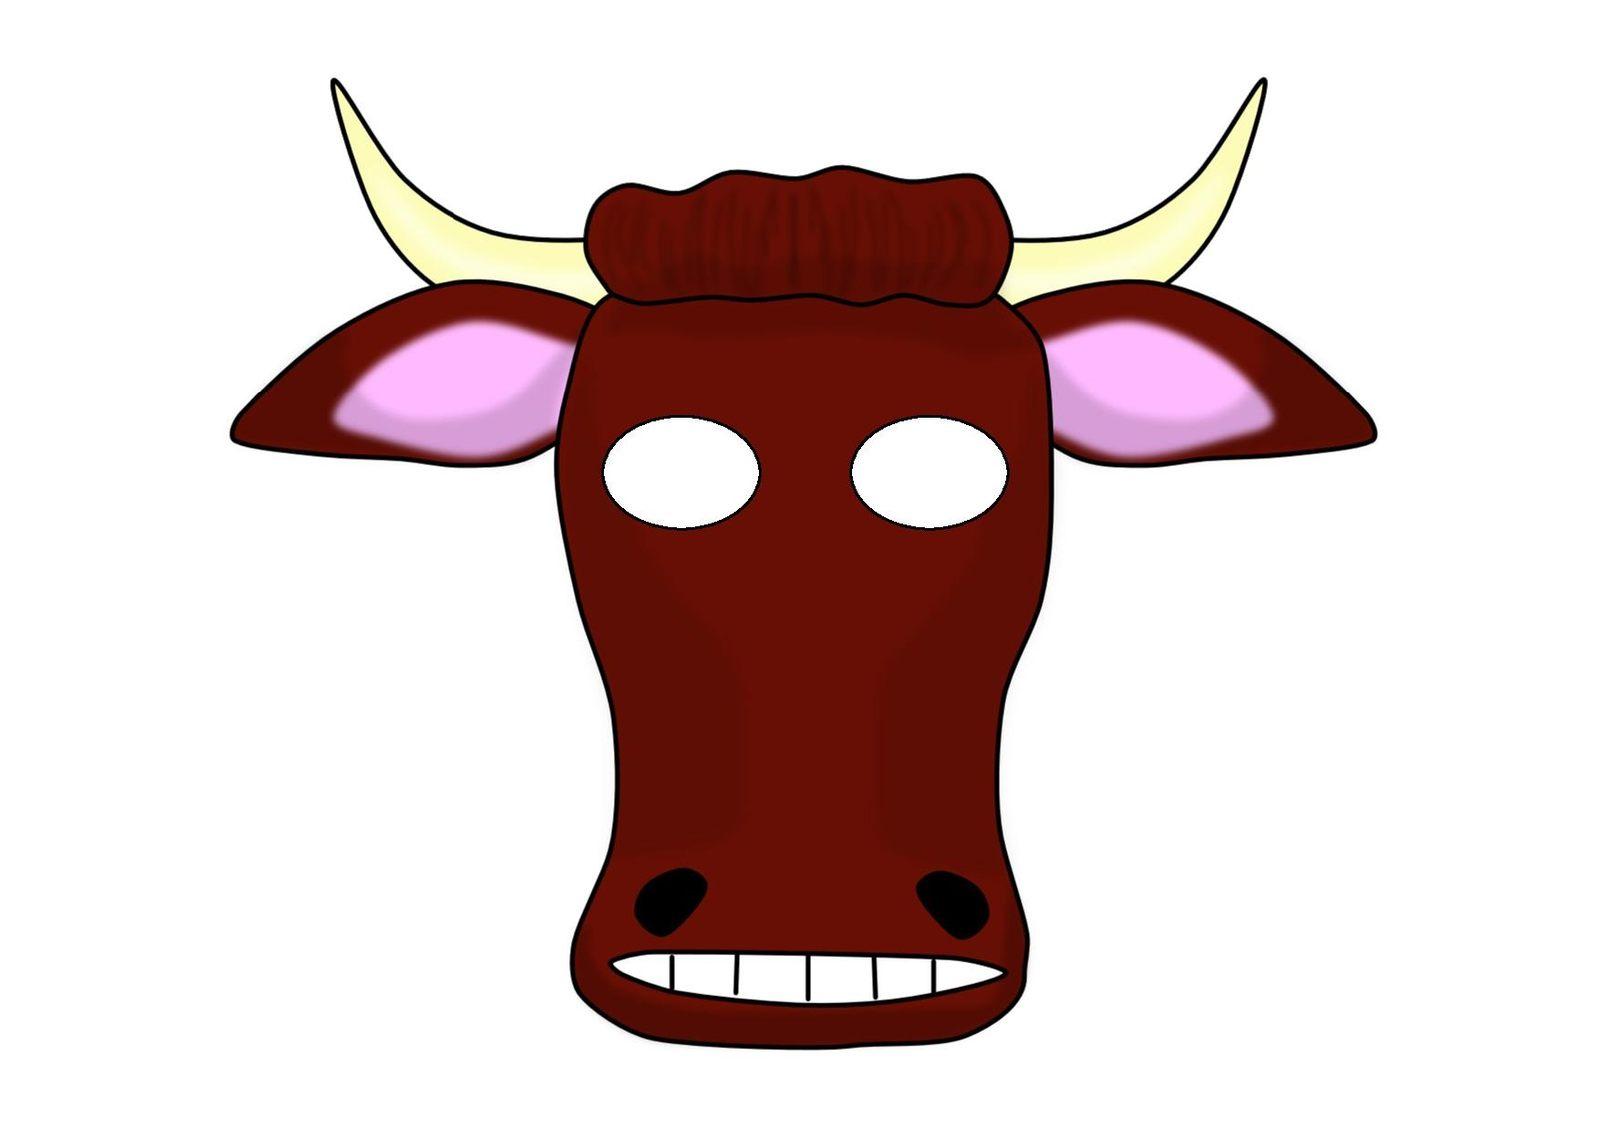 Маска коровы, зебры, жирафа на голову - распечатай шаблон